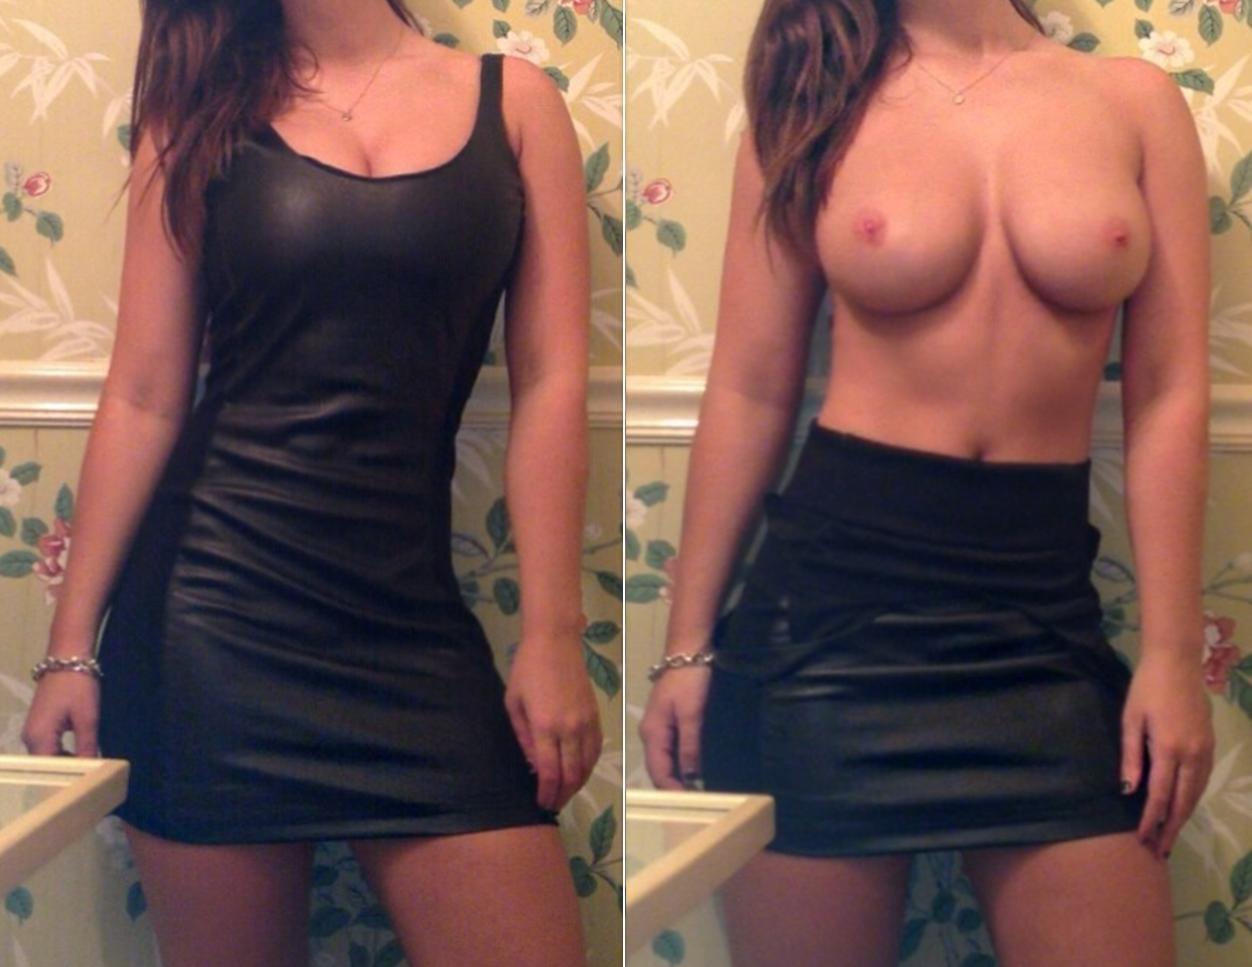 https://sexyna.org/wp-content/uploads/2019/10/Holky-před-a-po-81.jpg